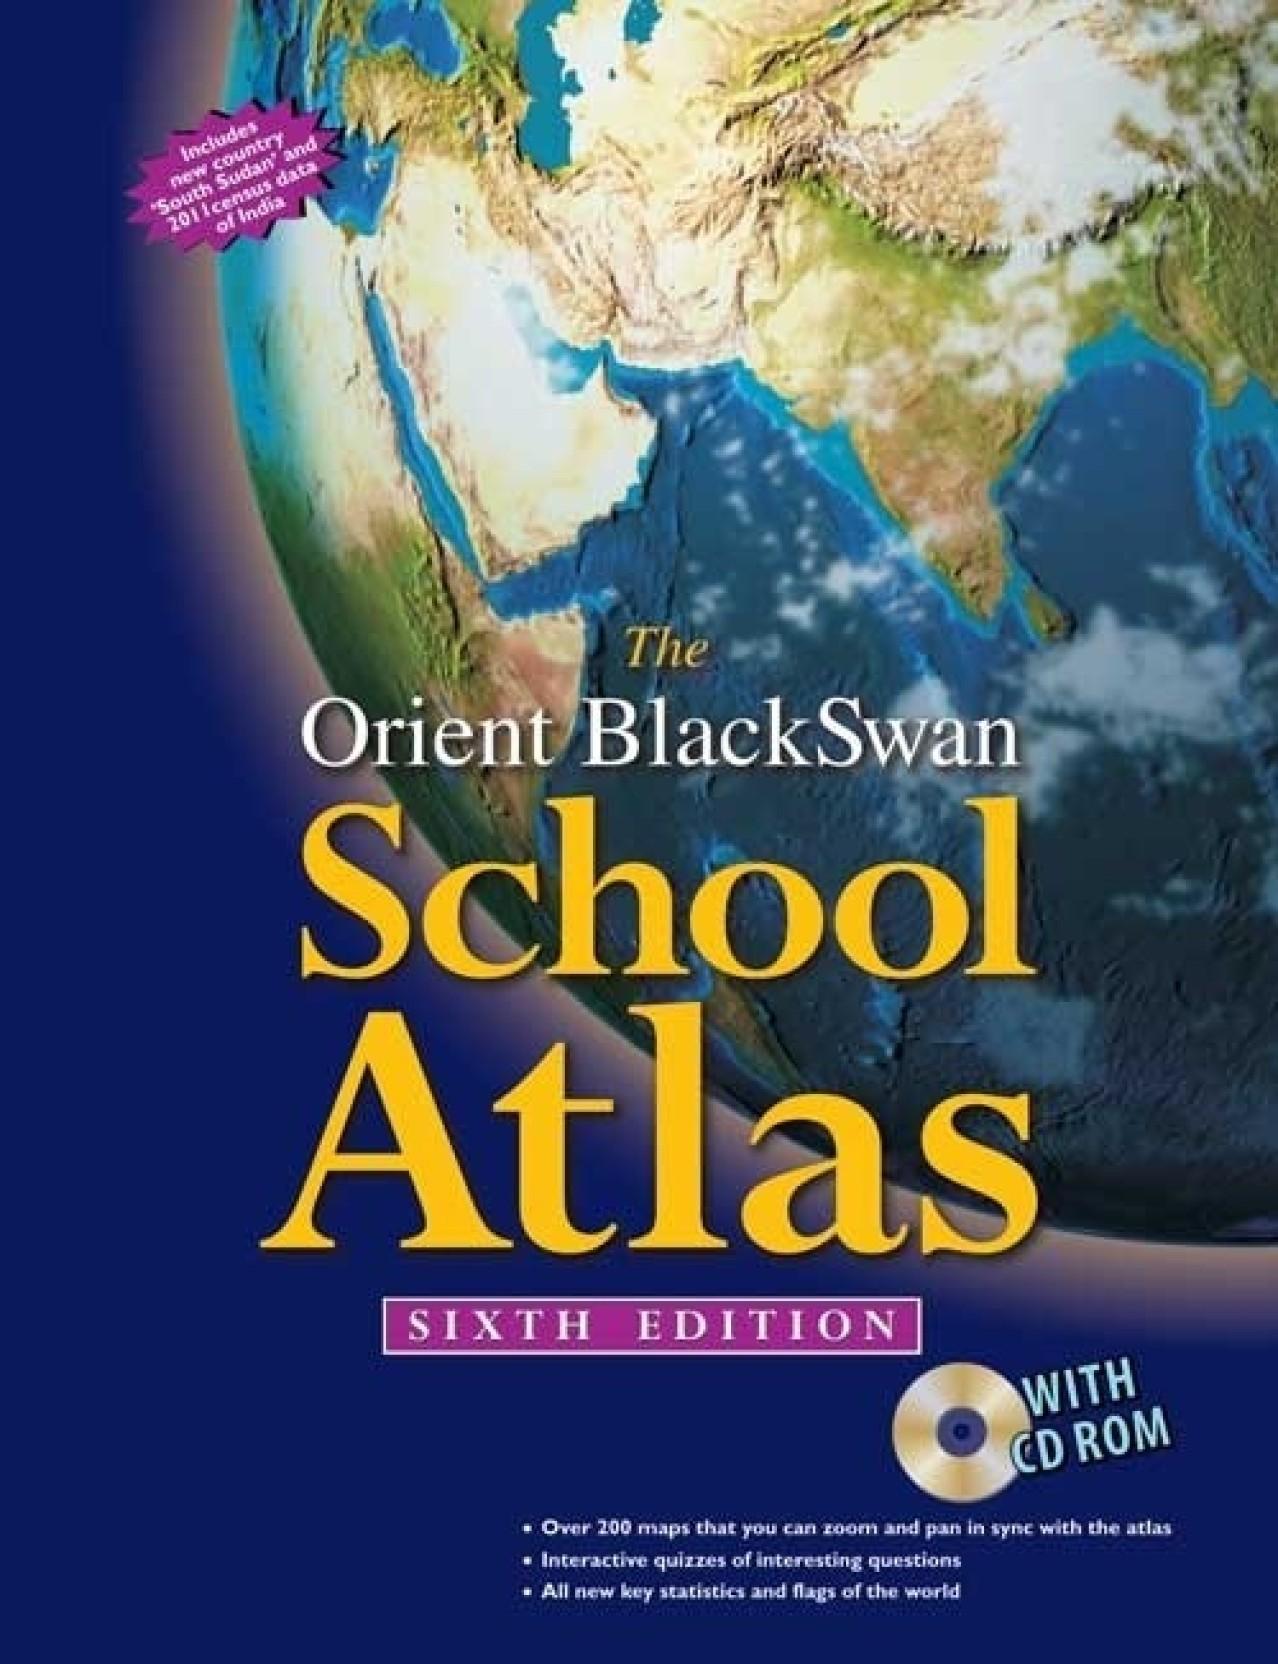 Book Cover Black Flipkart : The orient blackswan school atlas with cd rom th